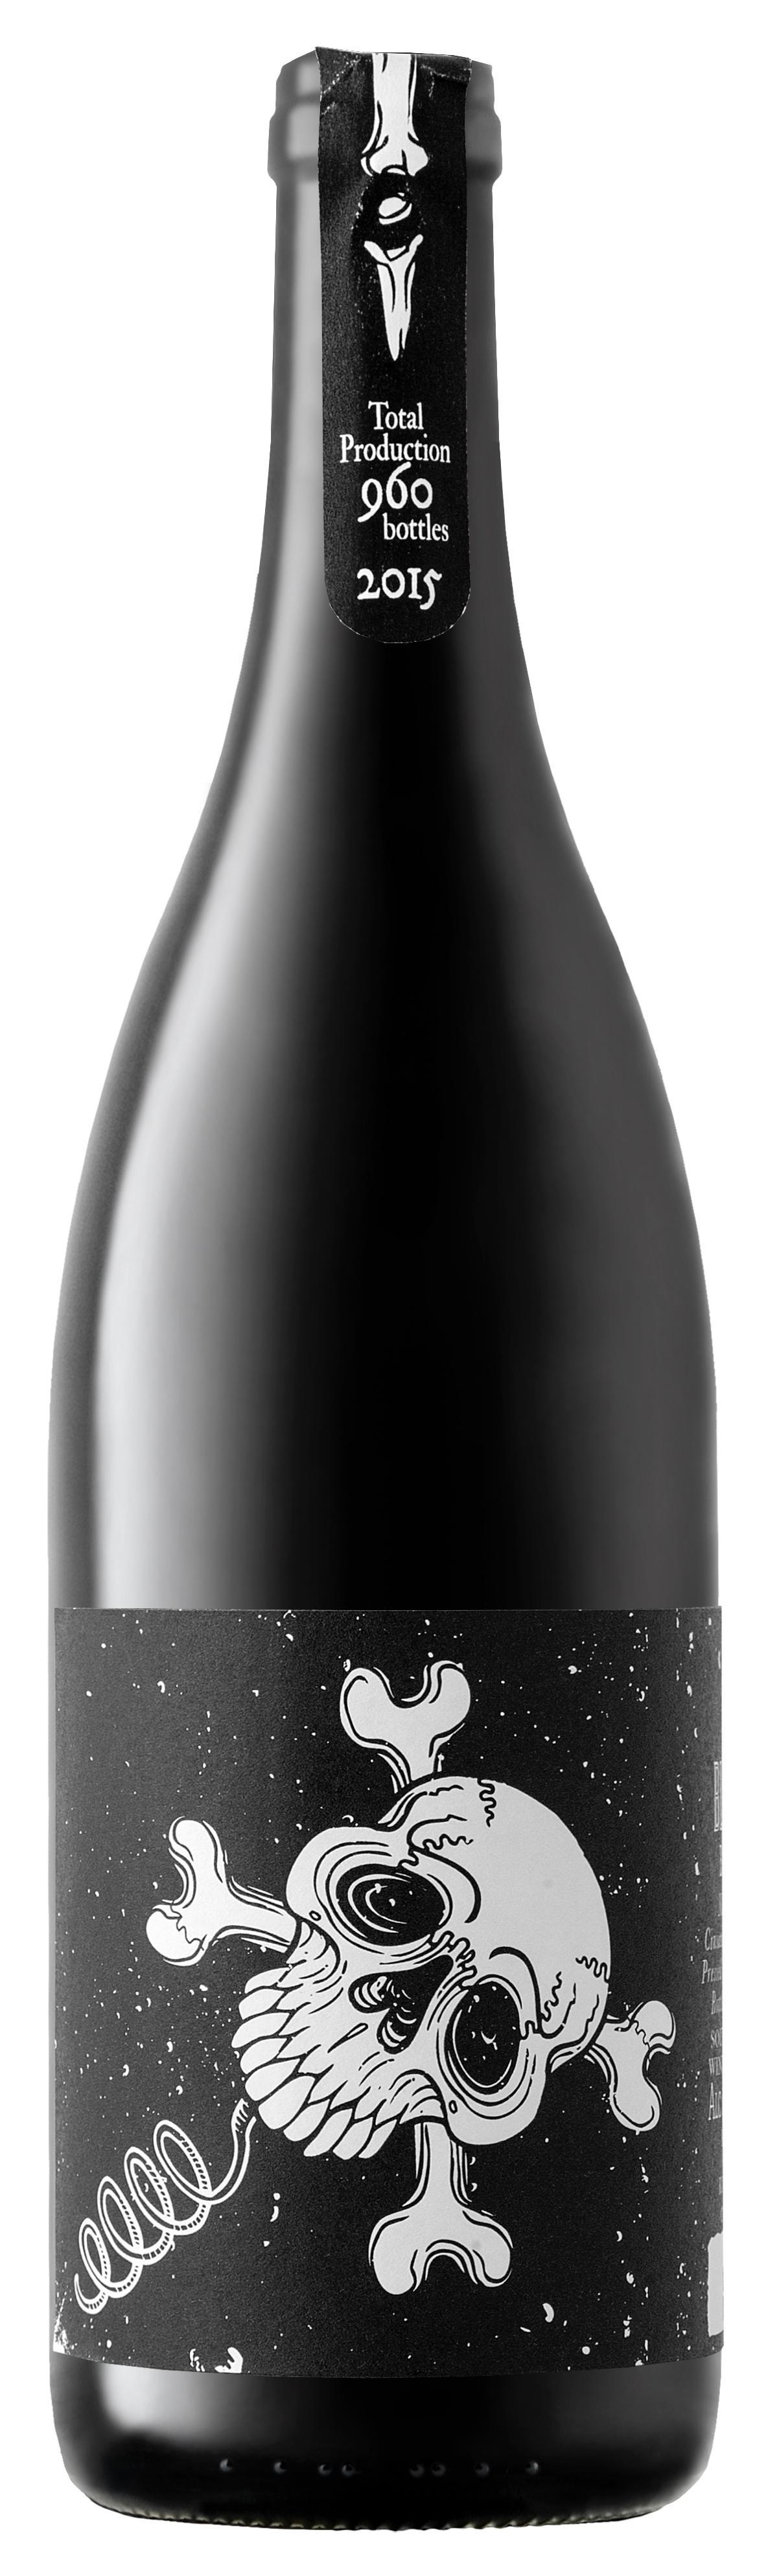 The Blacksmith Wines Barebones 2018